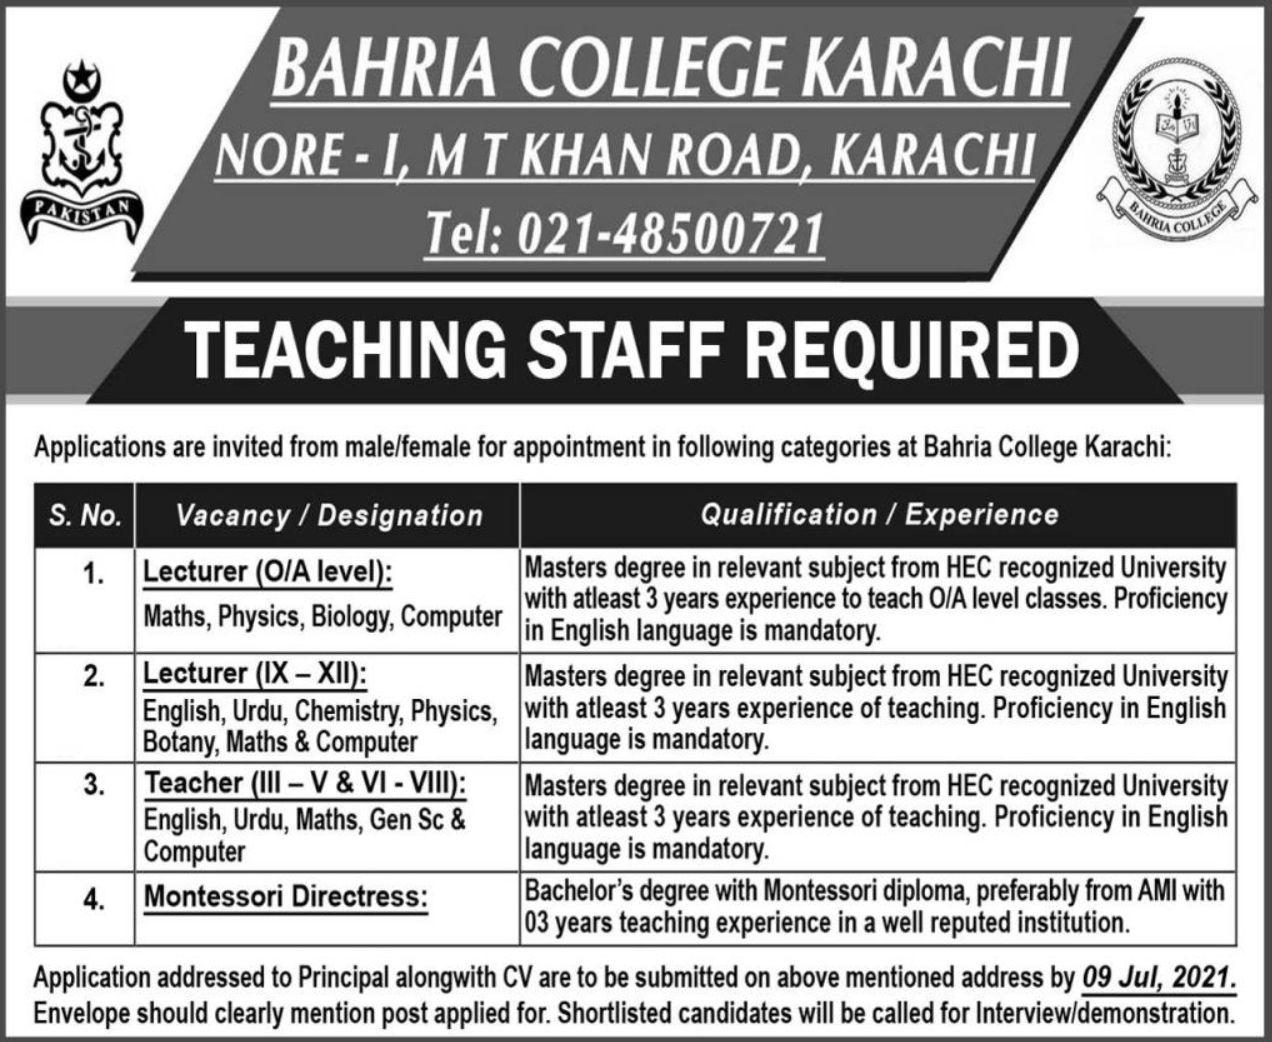 Bahria College Karachi Vacancies 2021 3